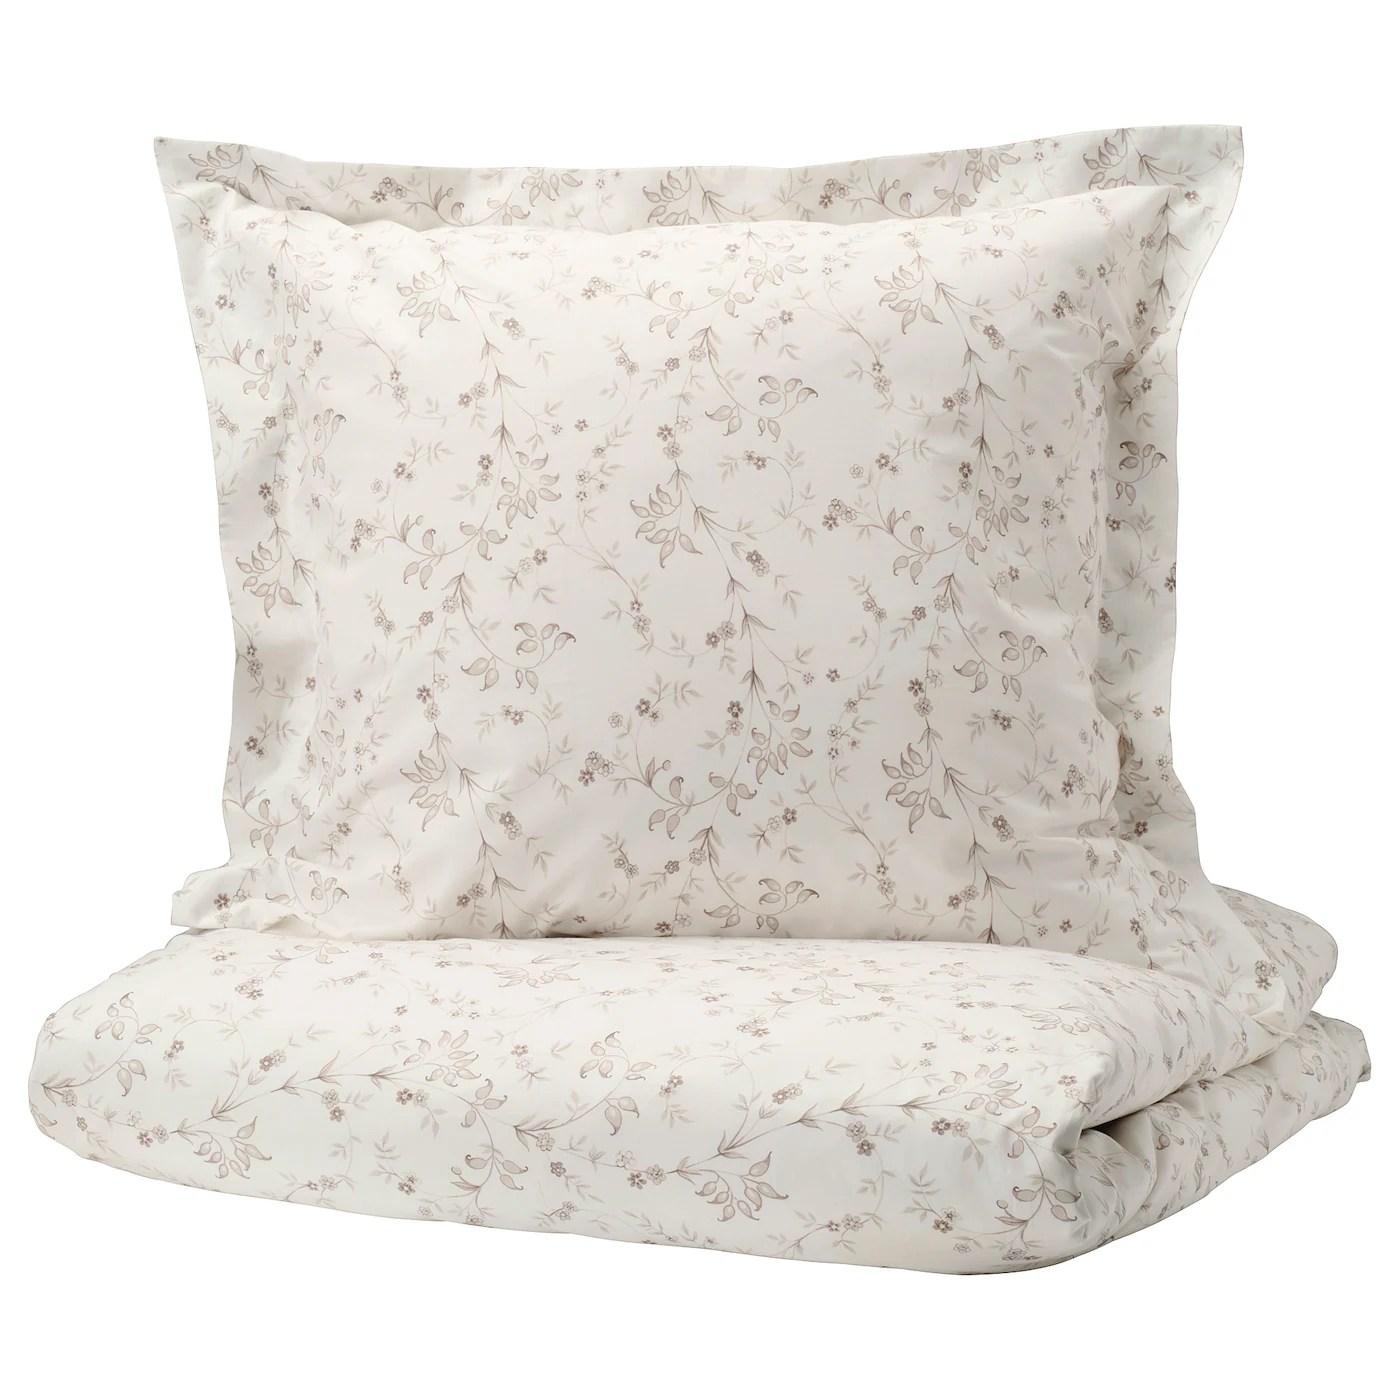 Strandfrane Housse Couette 2 Taies Blanc Beige Clair 240x220 65x65 Cm Ikea